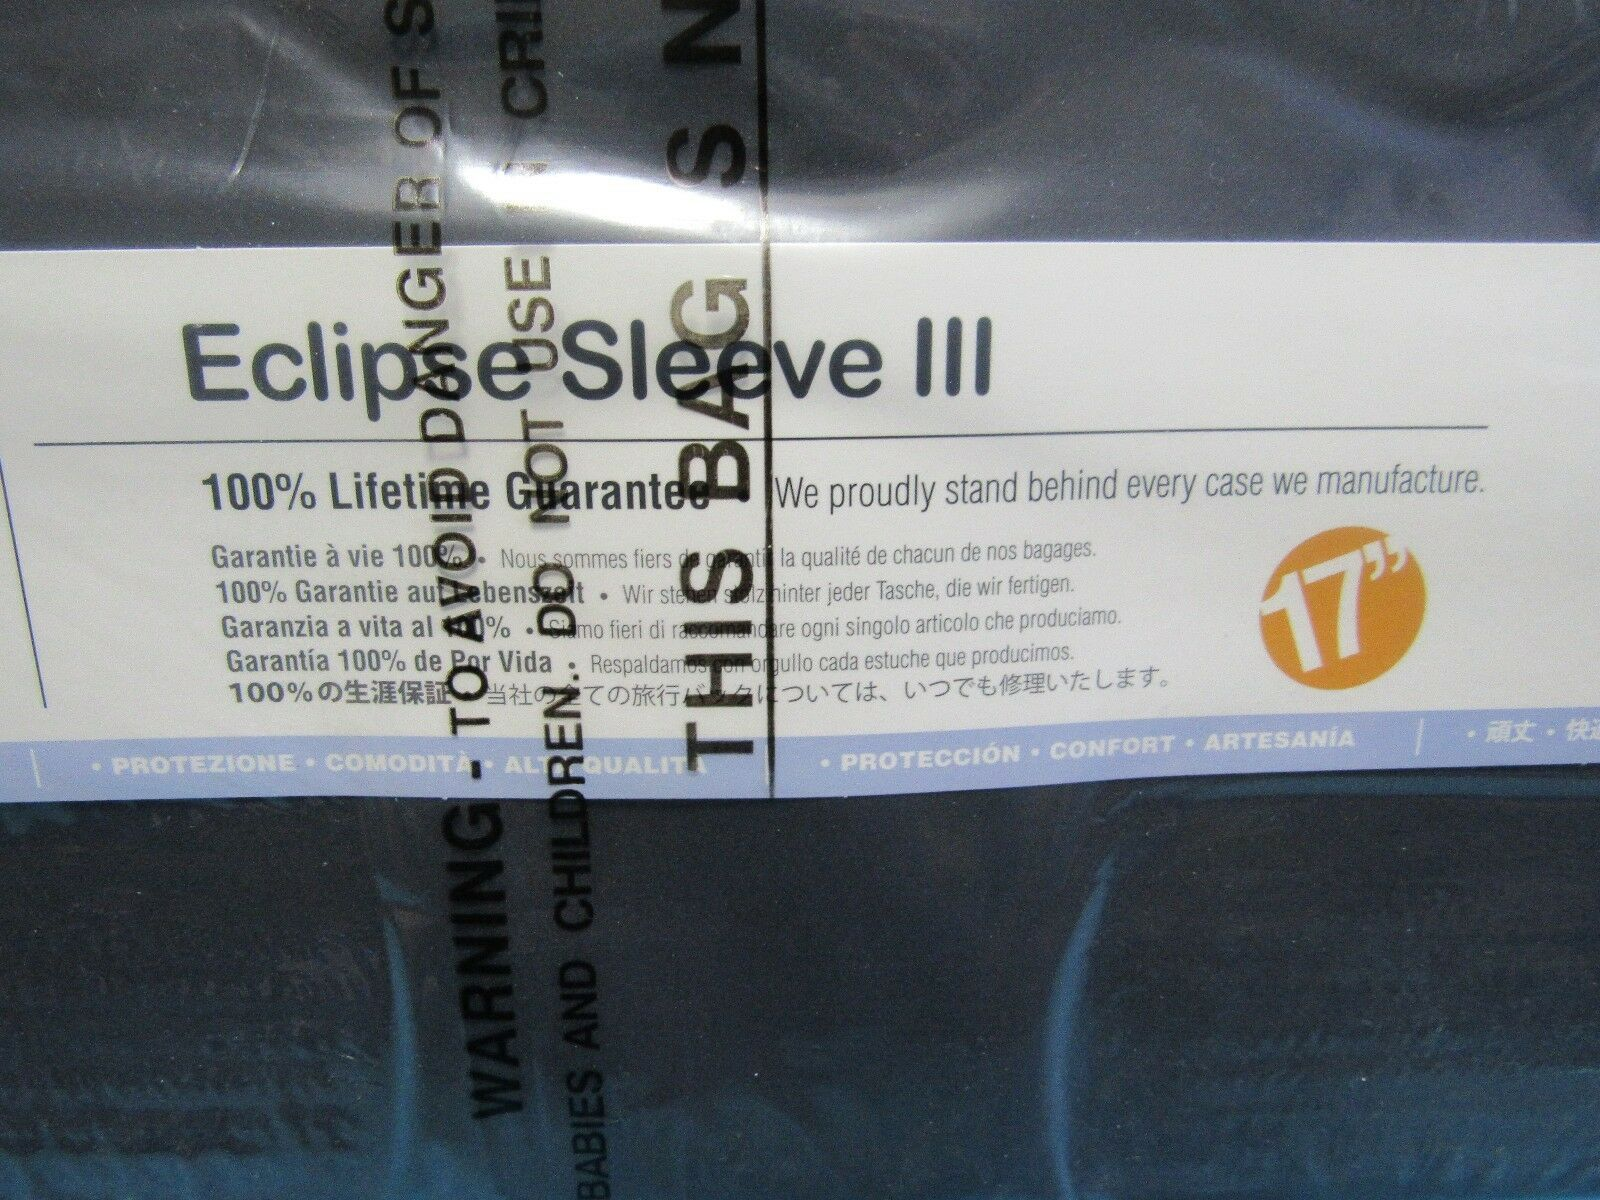 "Brenthaven Eclipse Sleeve III 17"" Laptop Lifetime Guarantee Craftsmanship"